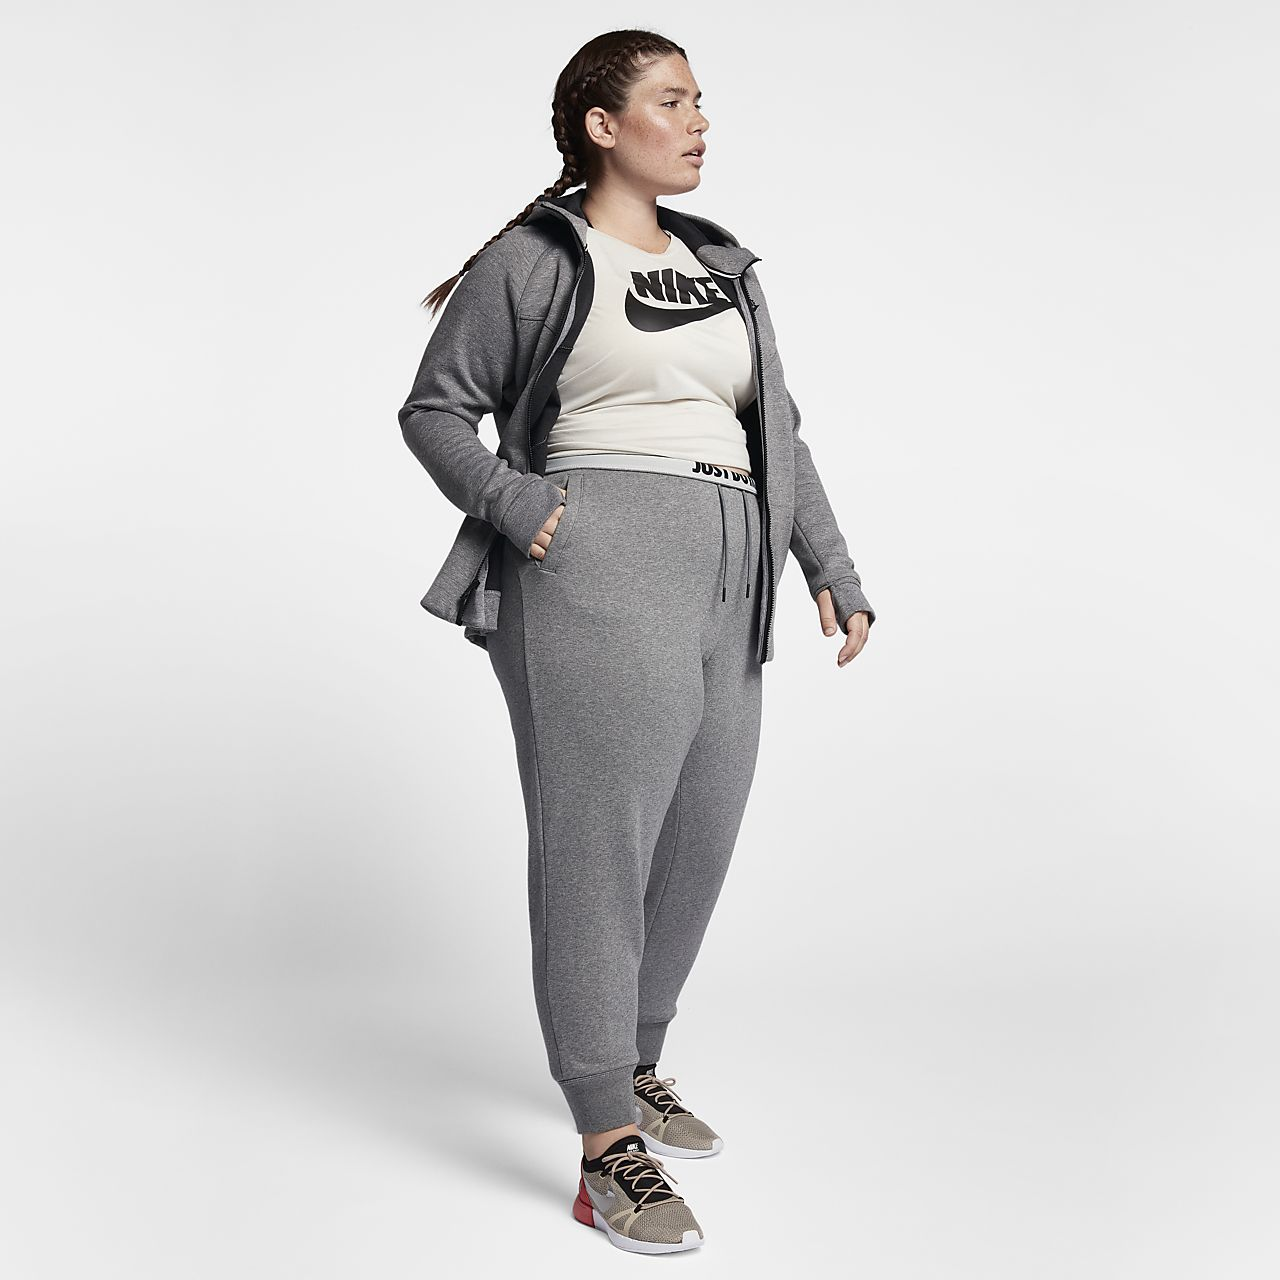 aec61d75aa1 Nike Sportswear Rally (Plus Size) Women s Trousers. Nike.com GB